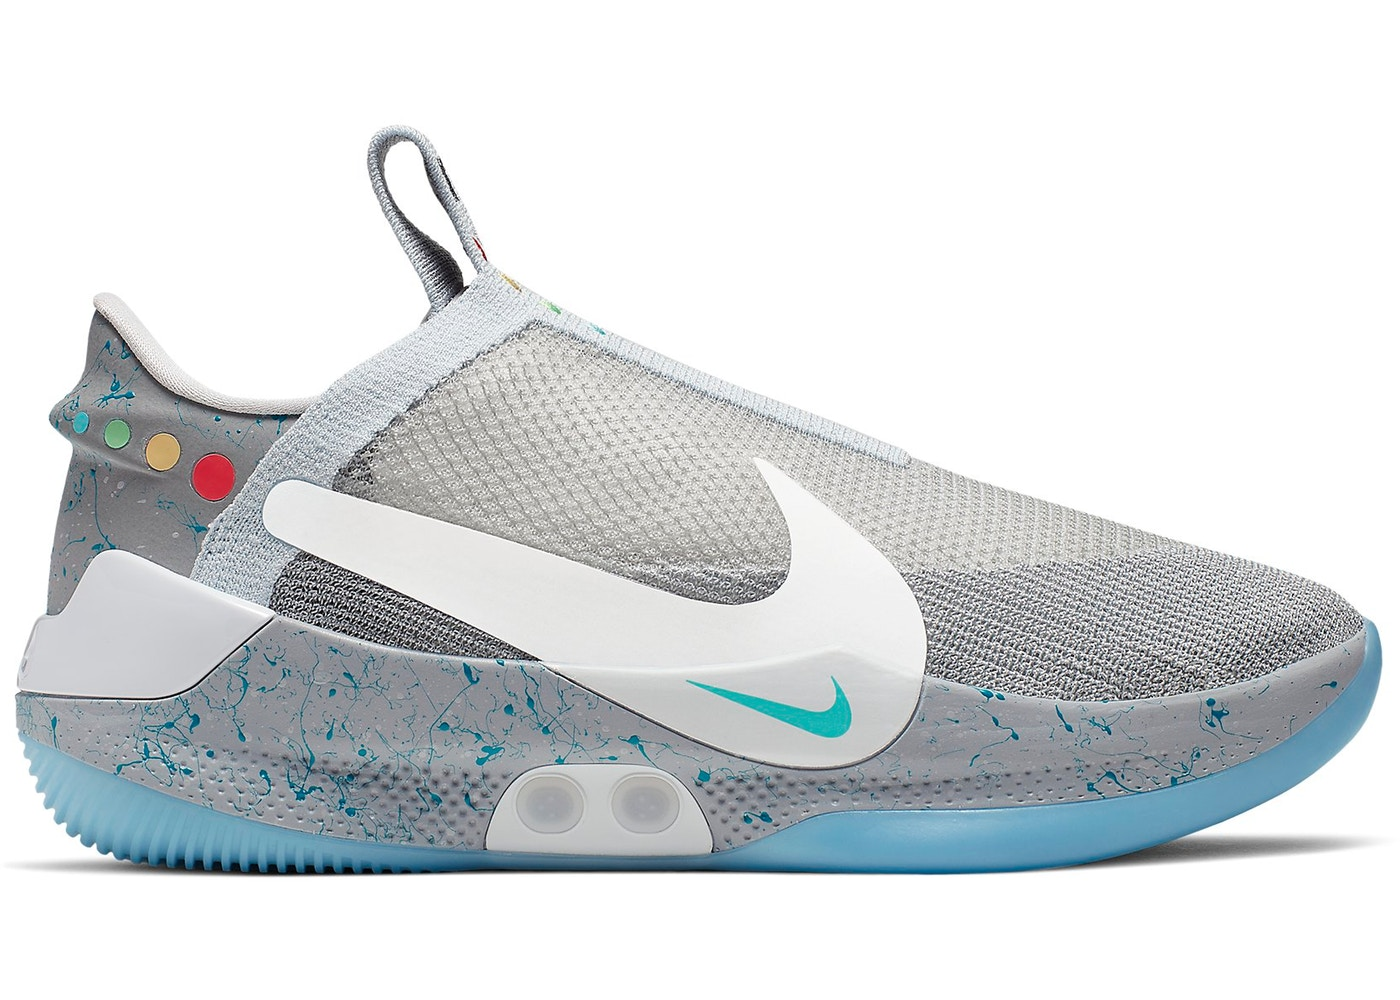 Nike 090 Bb ChargerCj5773 Mageu Adapt mwvON08n